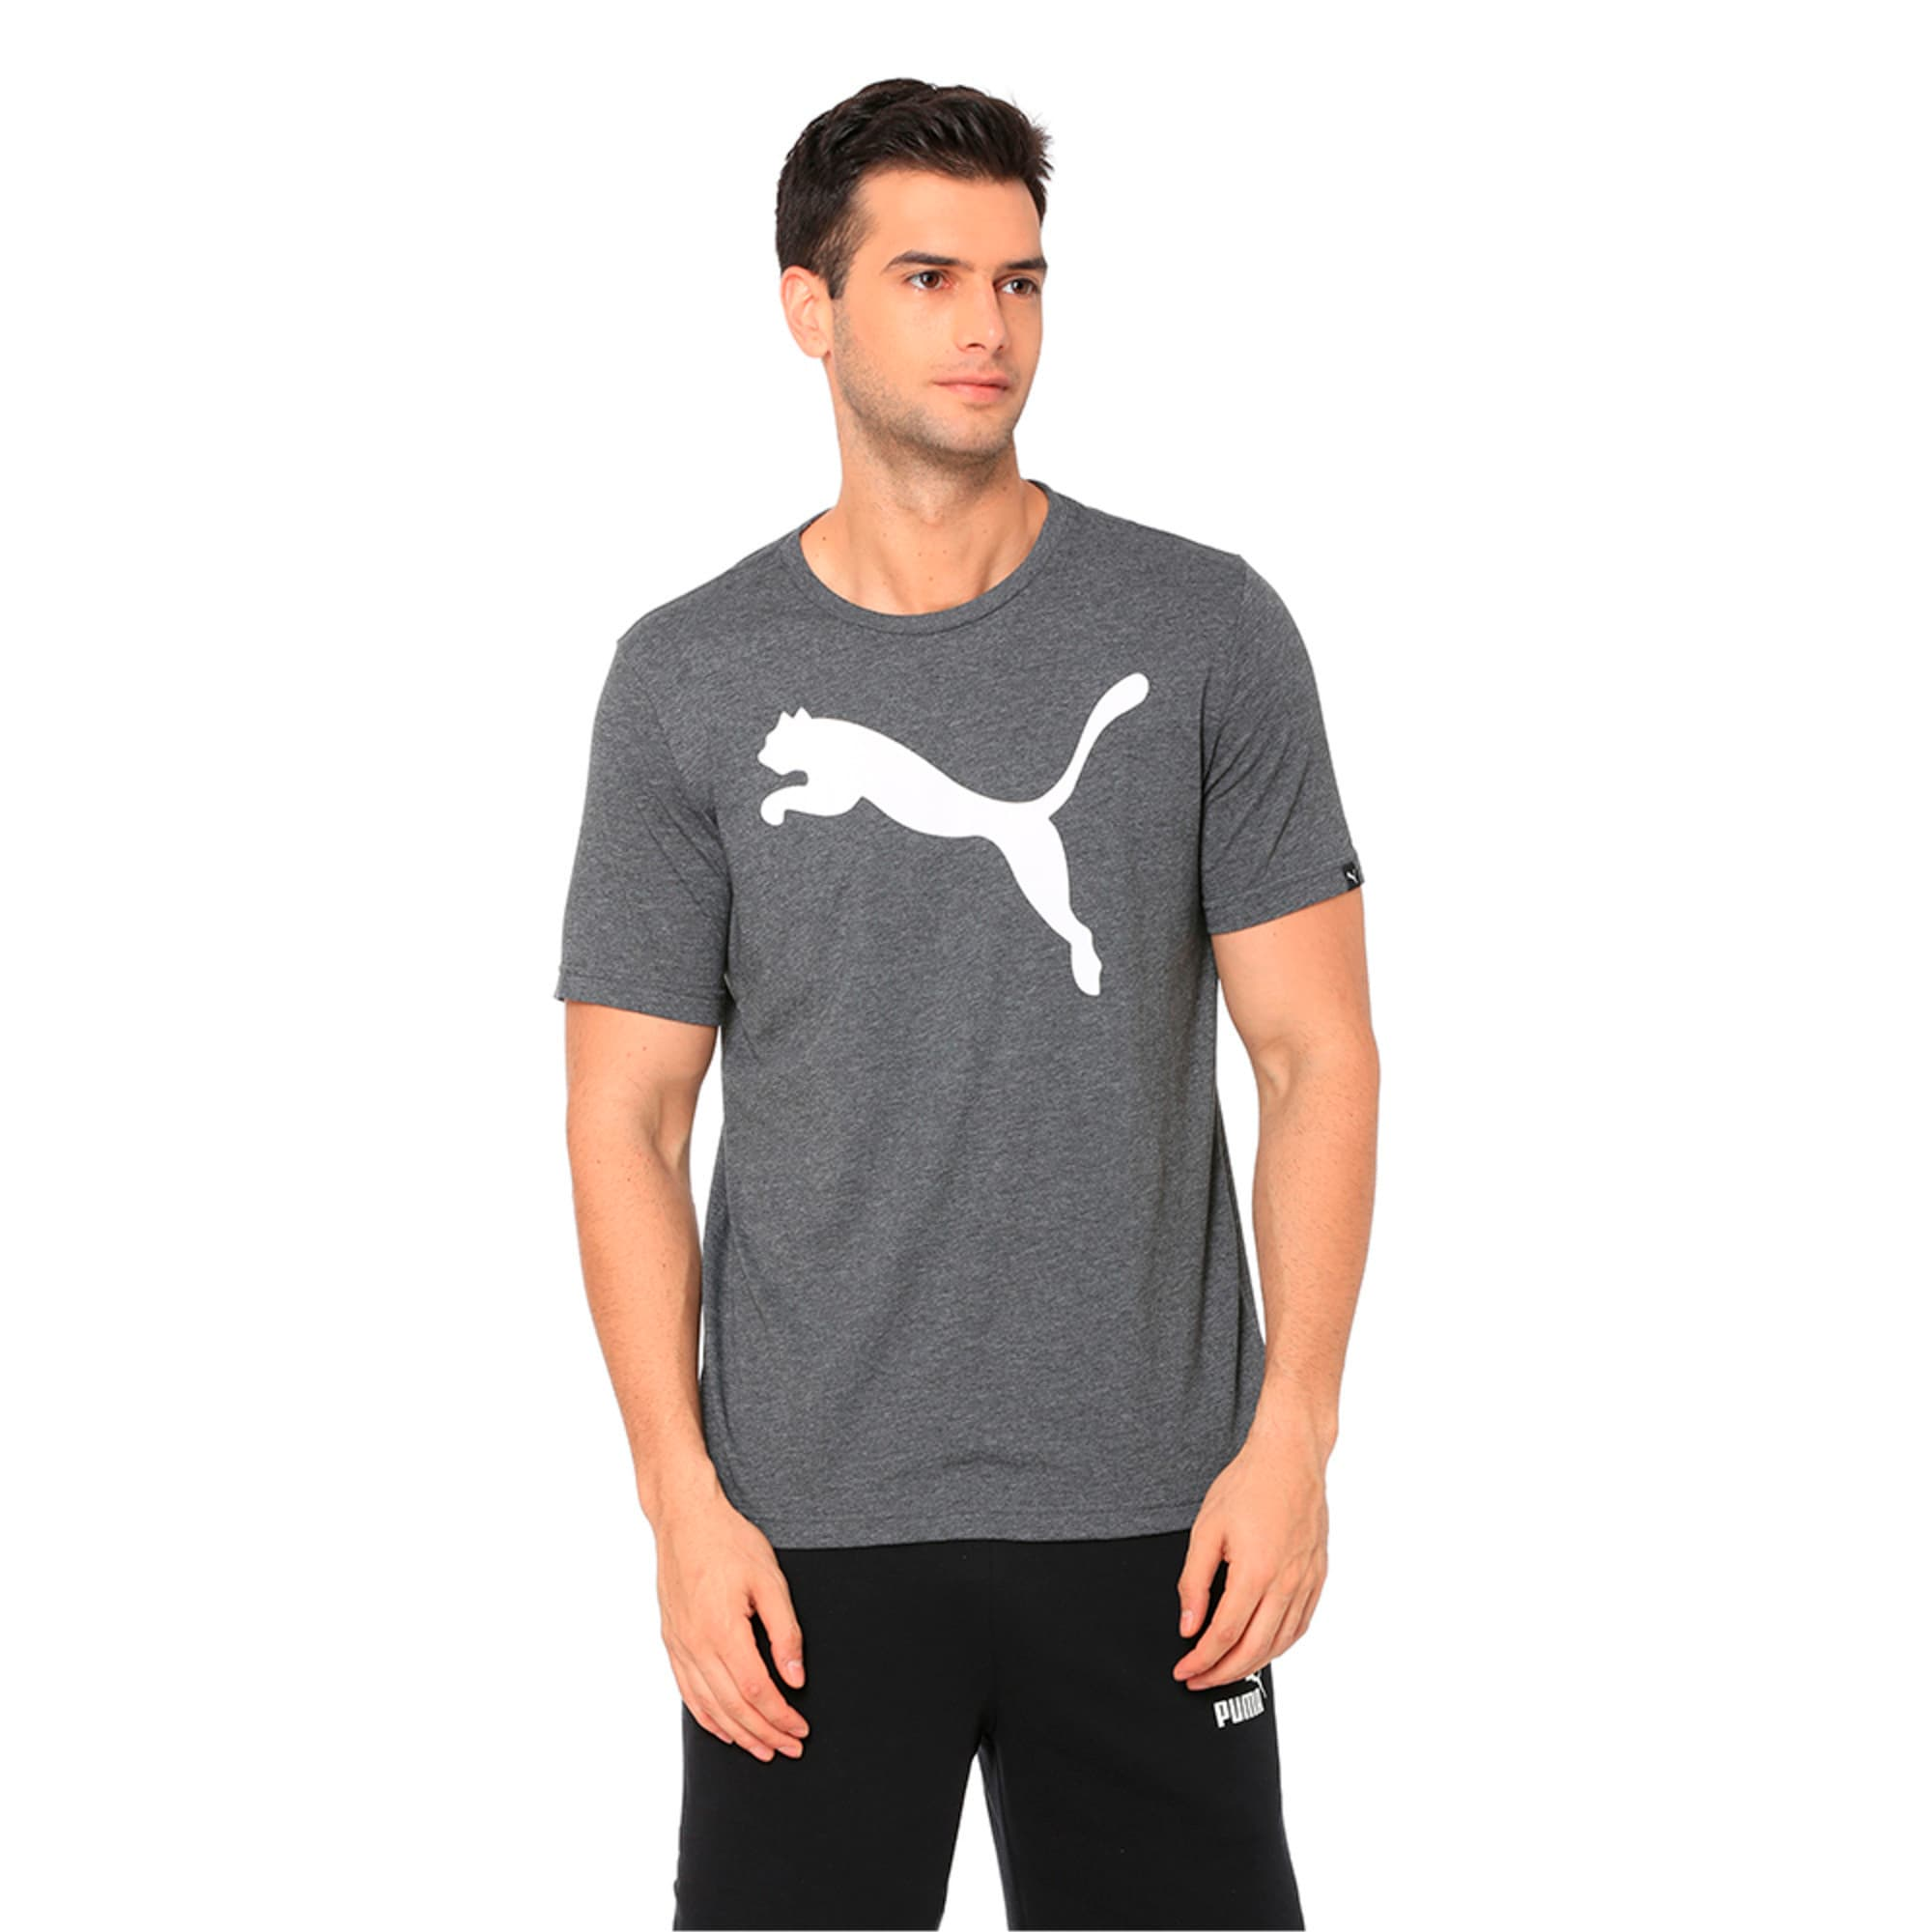 Thumbnail 1 of Men's Big Cat Heather T-Shirt, Puma Black Heather, medium-IND